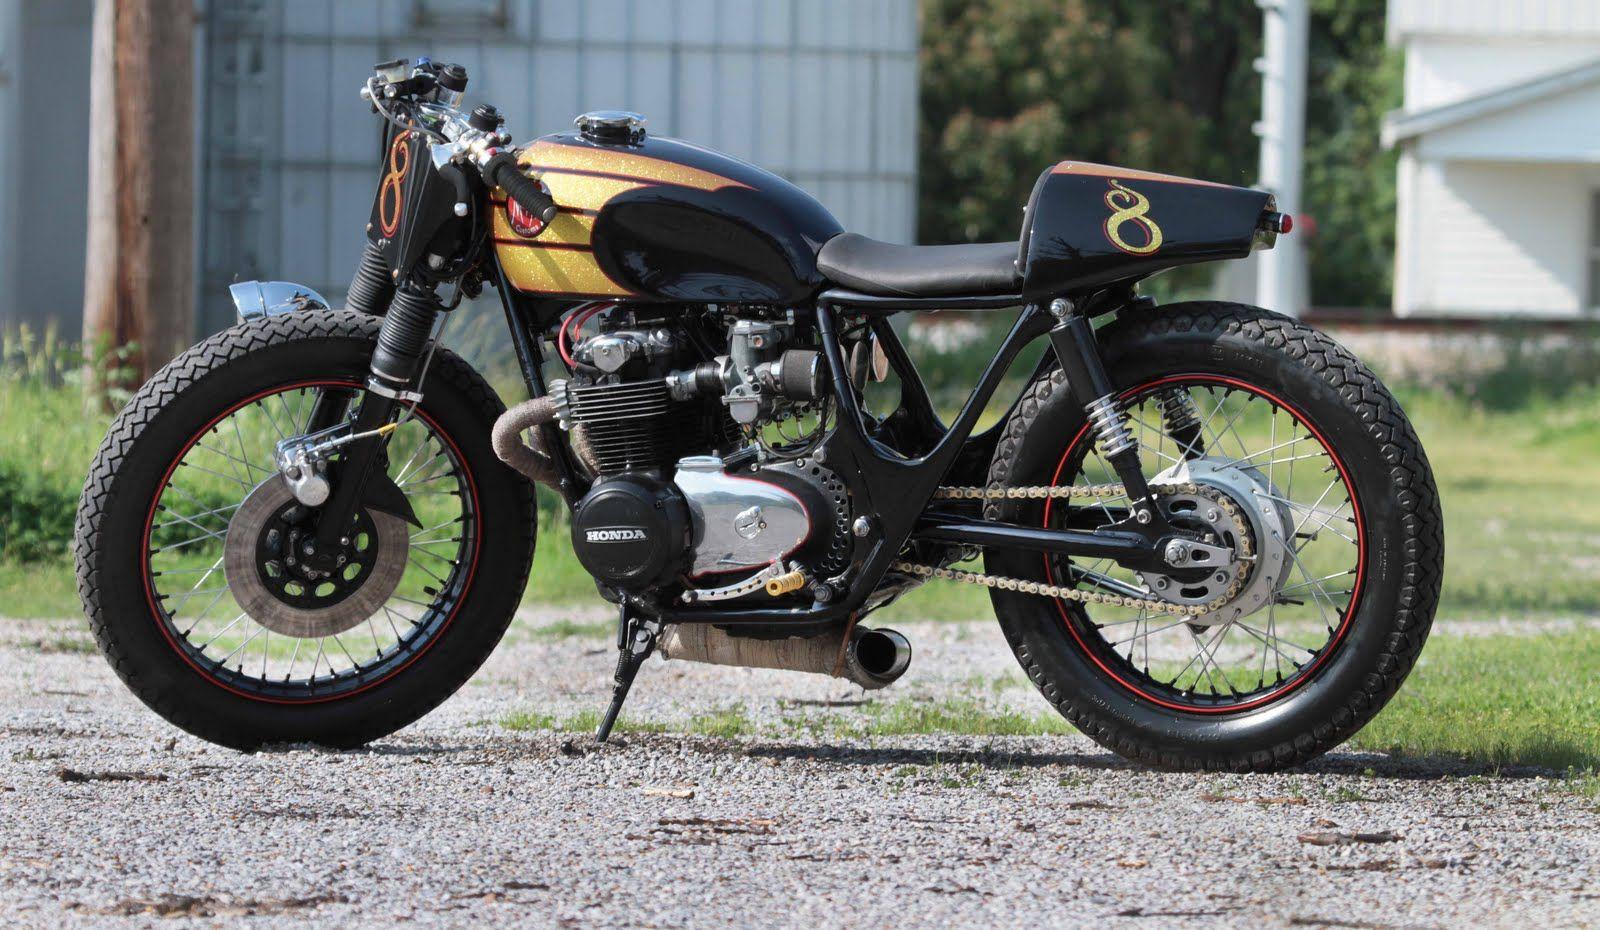 1972 Honda Cb175 Cafe Racer Google Search Cb500 Cafe Racer Best Motorbike Cafe Racer [ 930 x 1600 Pixel ]